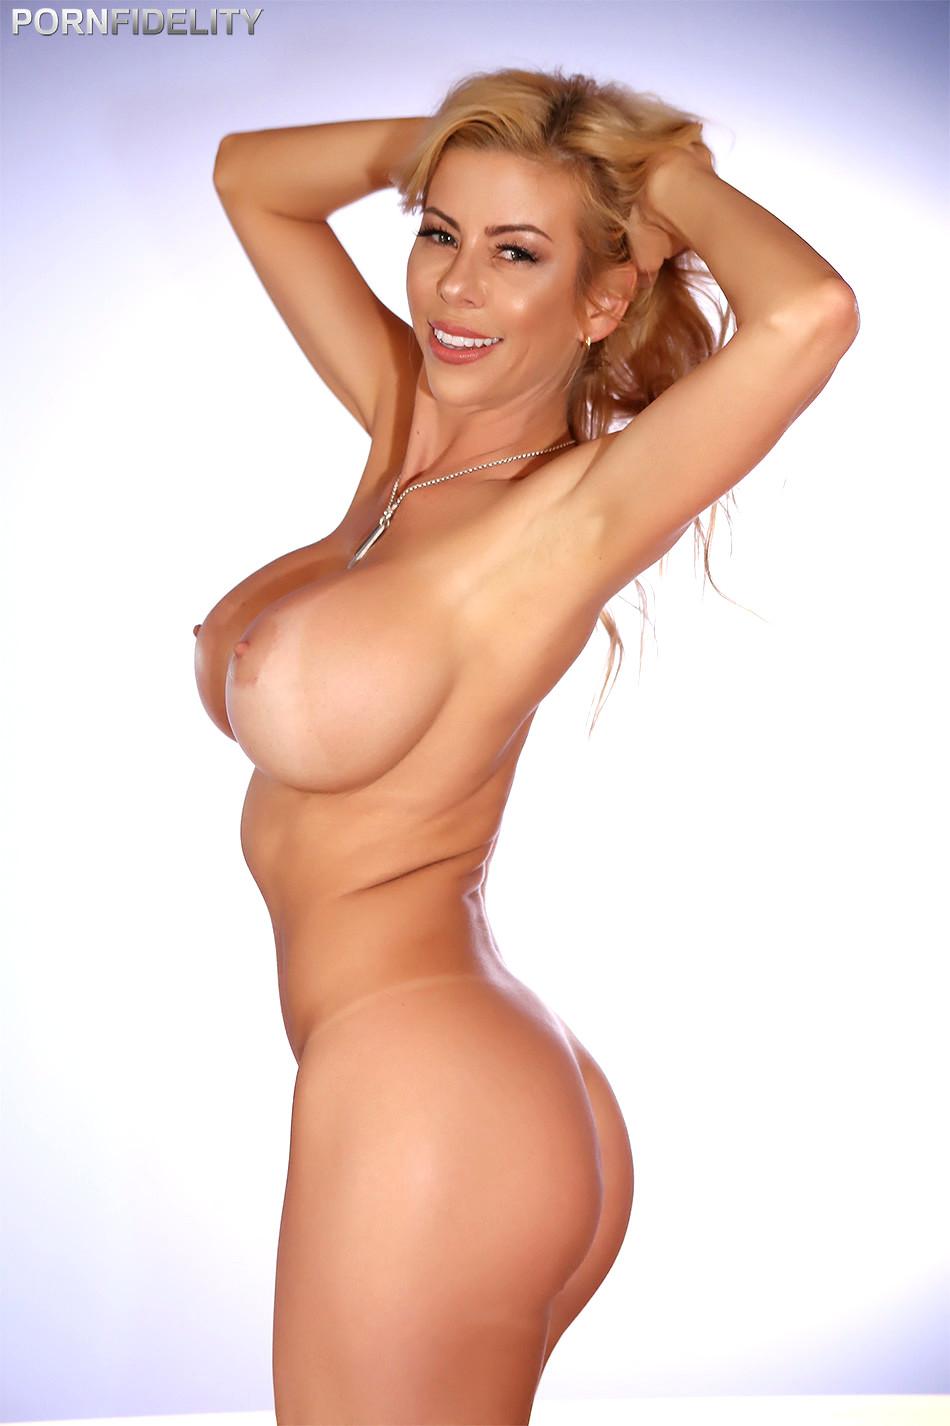 Porn Fidelity Alexis Fawx Unique Pornstars Pussy Sex Hd Pics-2132